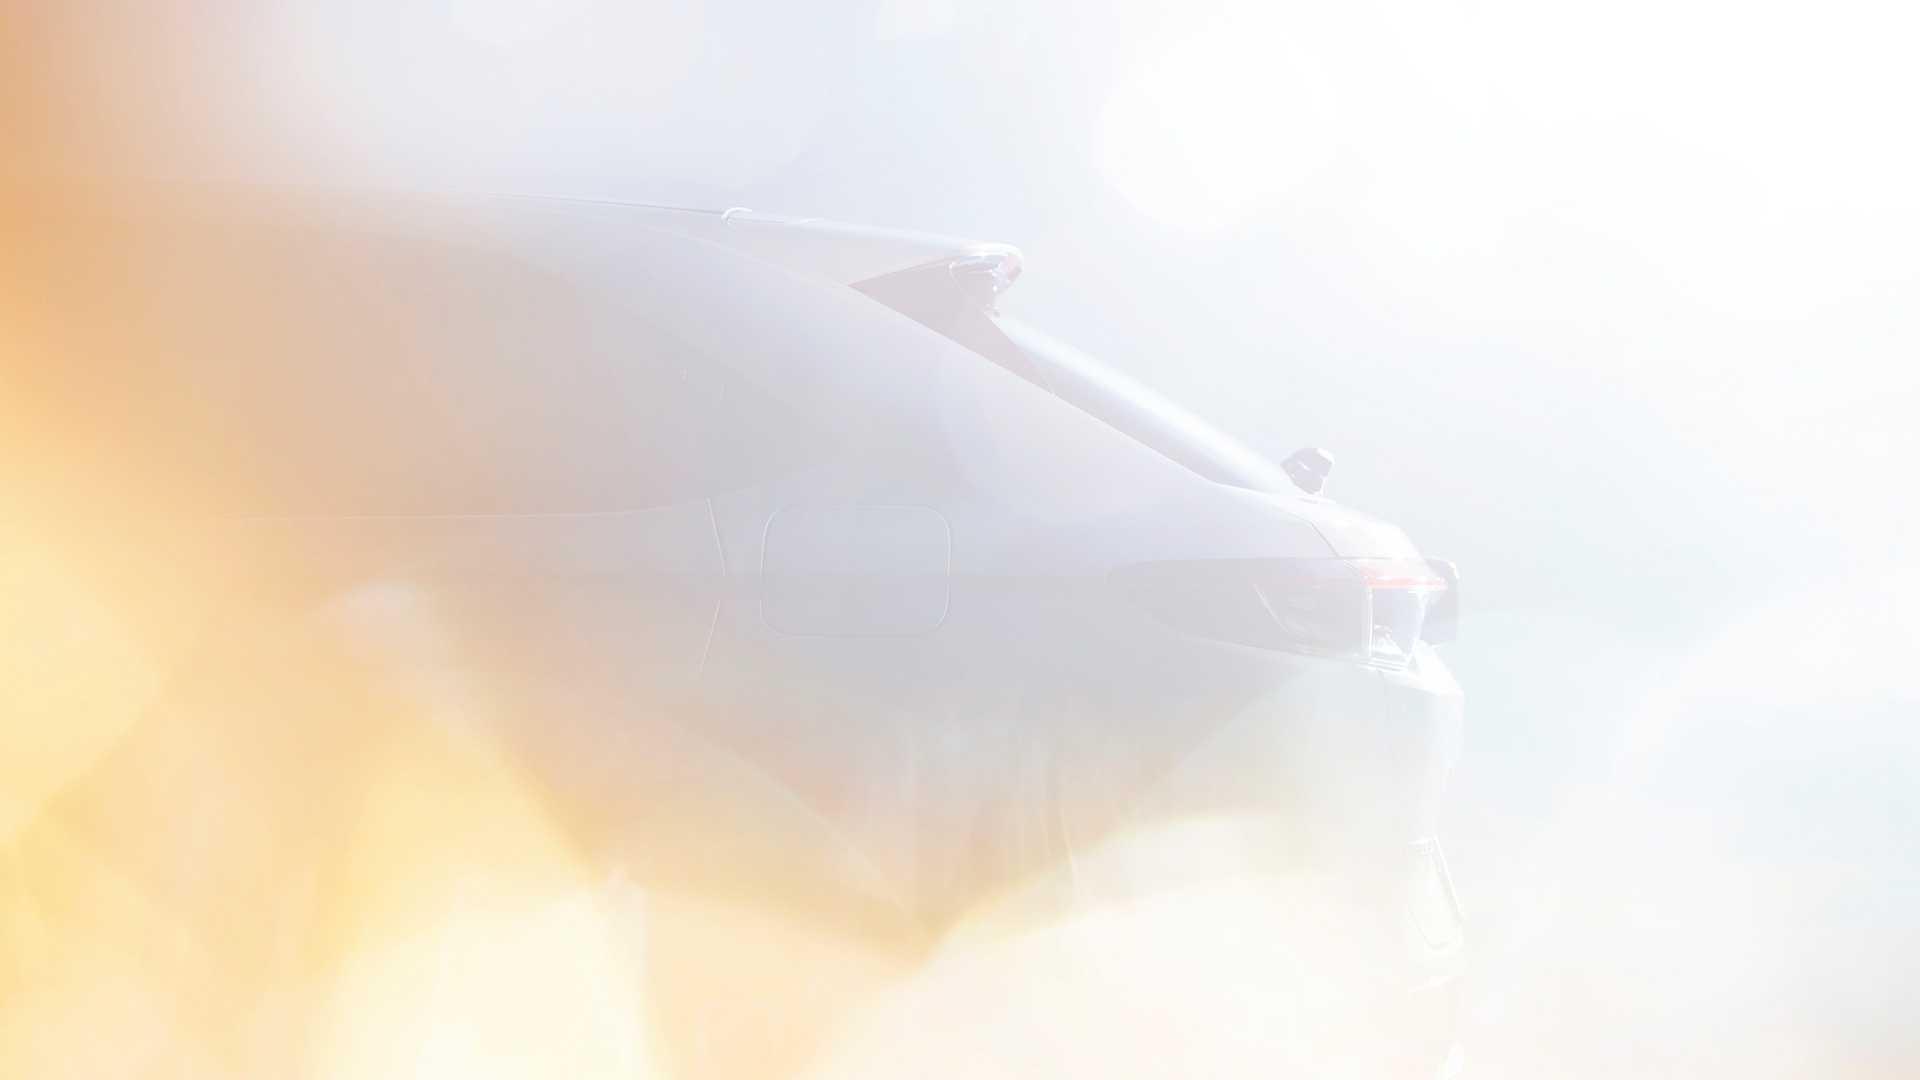 https://cdn.motor1.com/images/mgl/WOp41/s6/honda-hr-v-2021-il-teaser.jpg